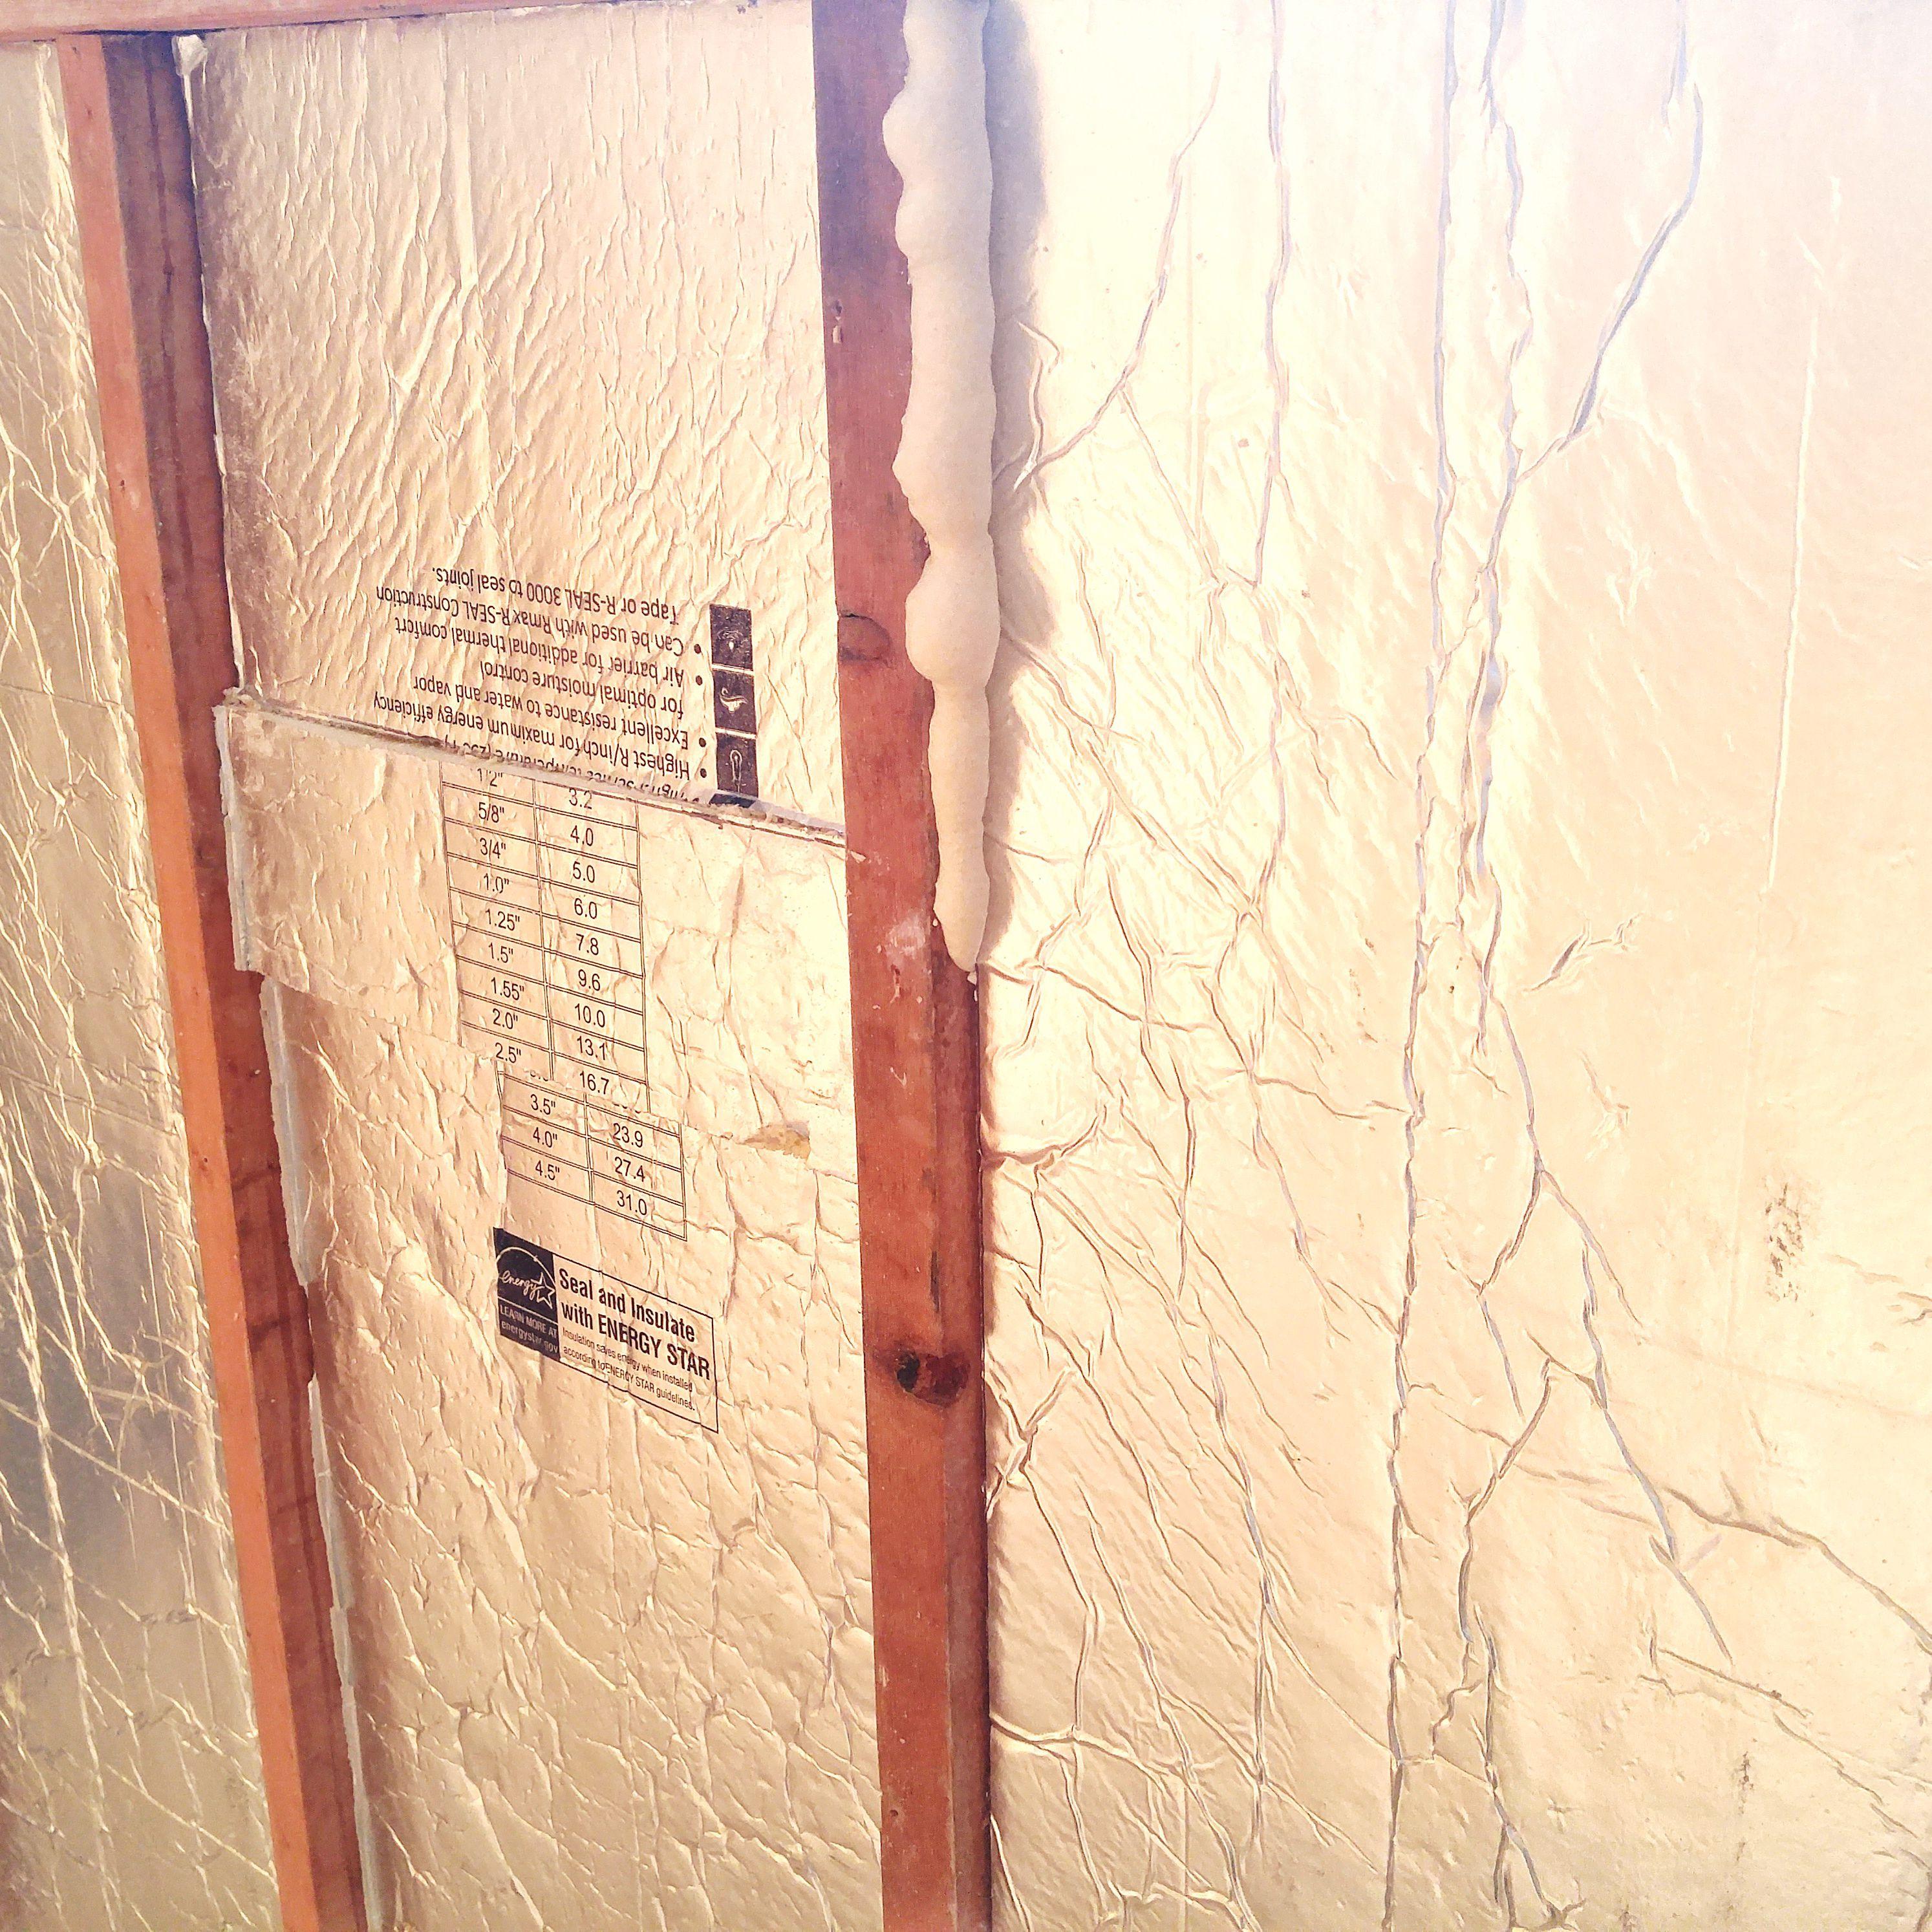 Rigid Foam Board Insulation Between Studs